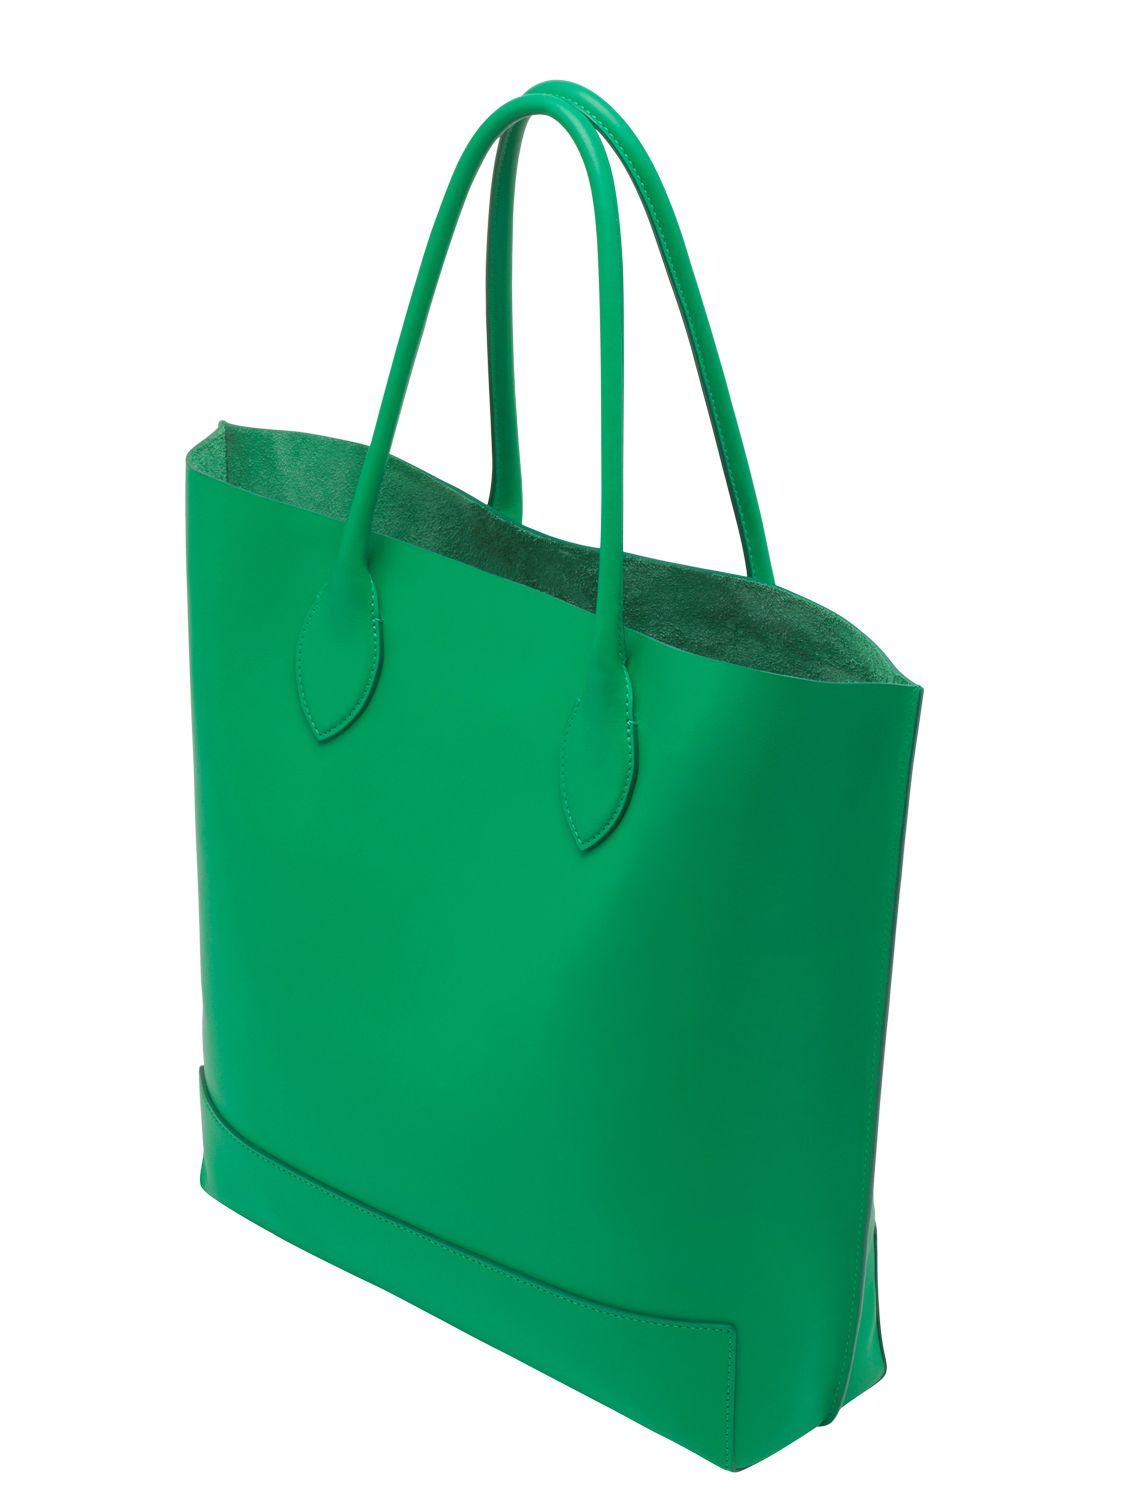 423ed56375 ... australia mulberry blossom nappa leather tote bag in green lyst e1fc2  be6c0